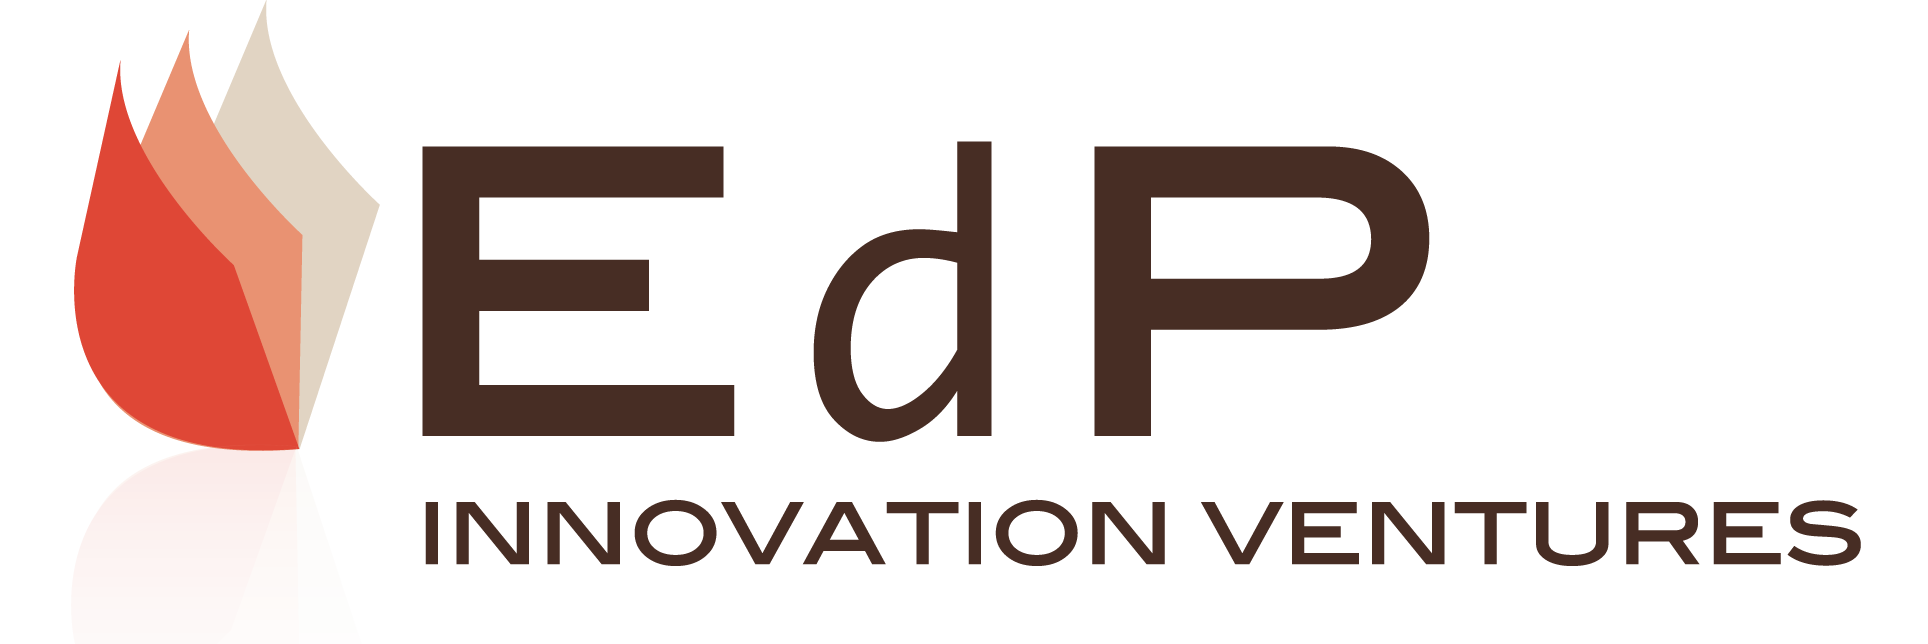 EdP Innovation Ventures